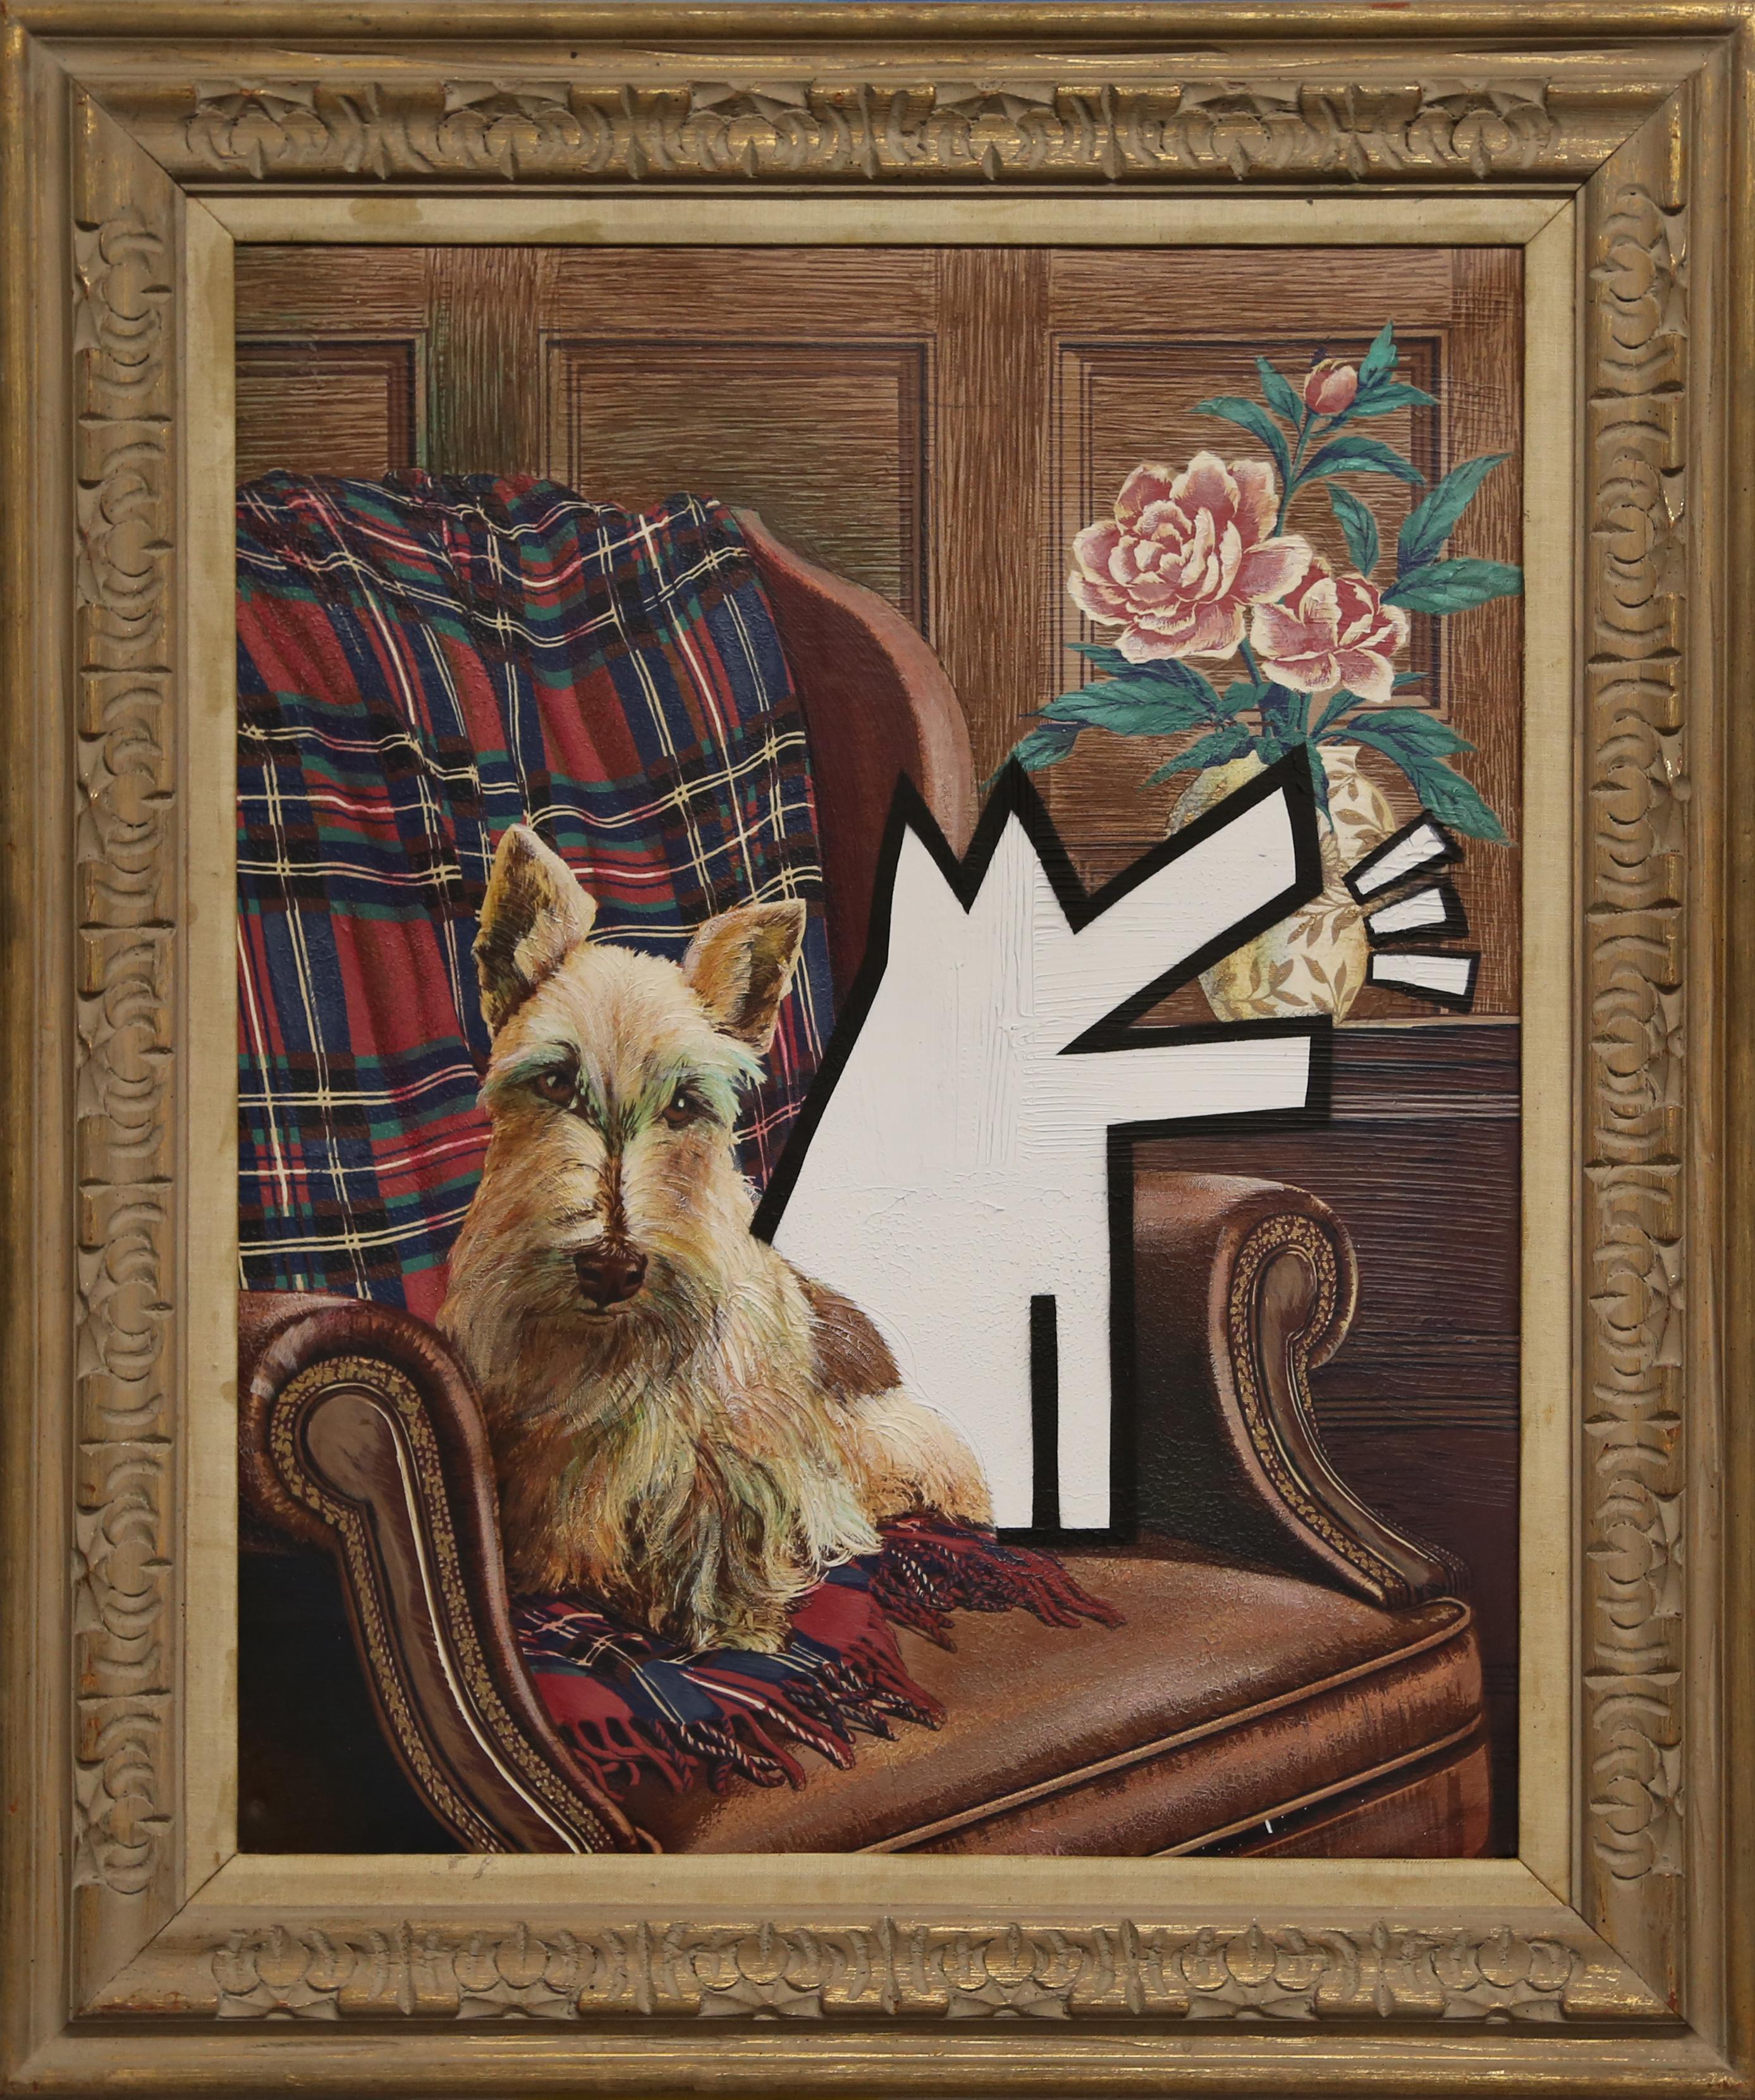 Keith's Dog by TMFA